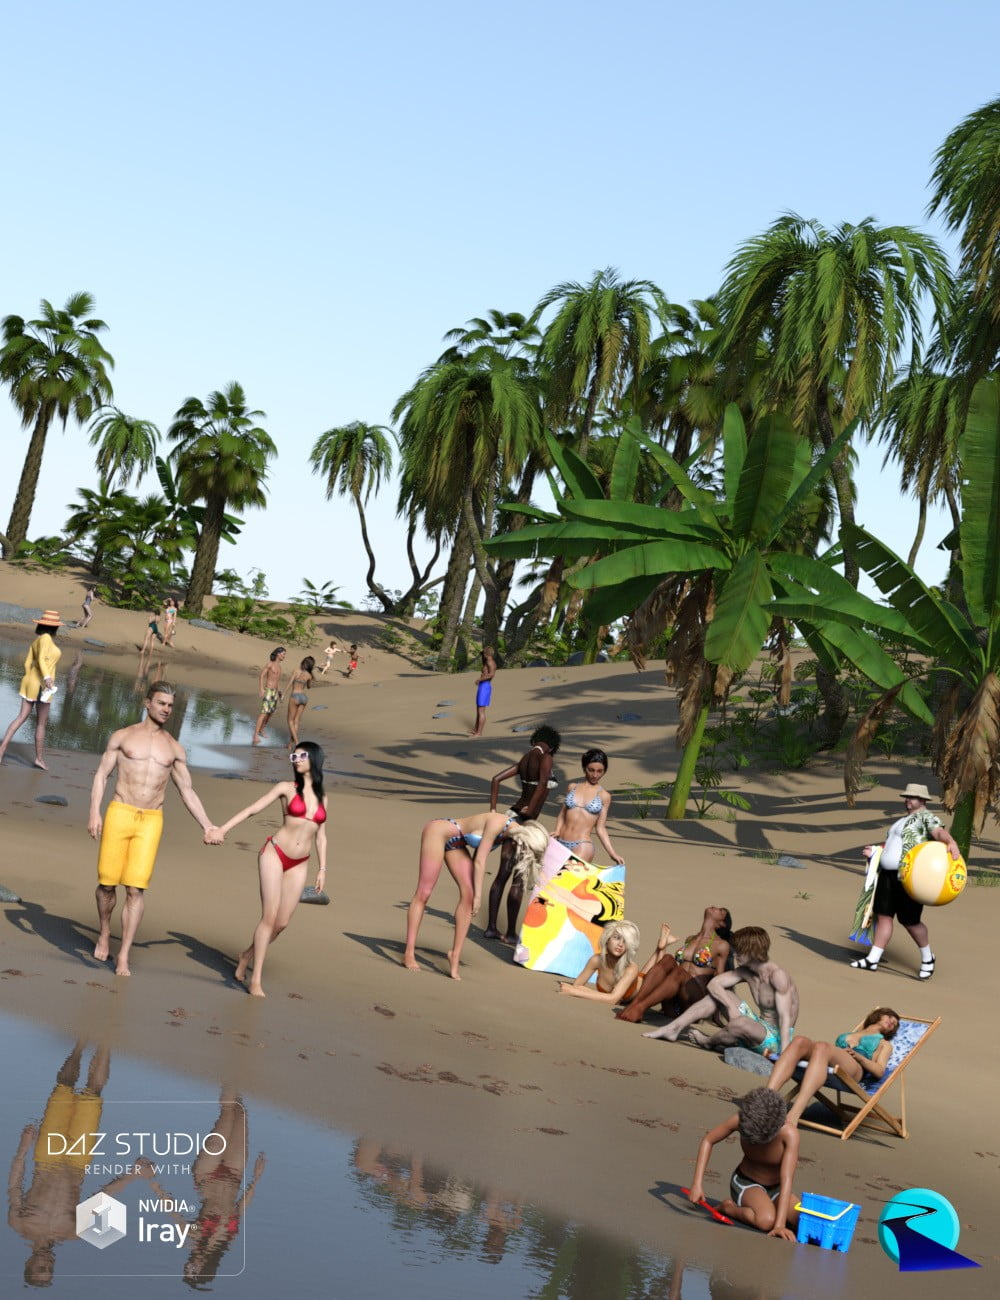 Now-Crowd Billboards - Beach Life